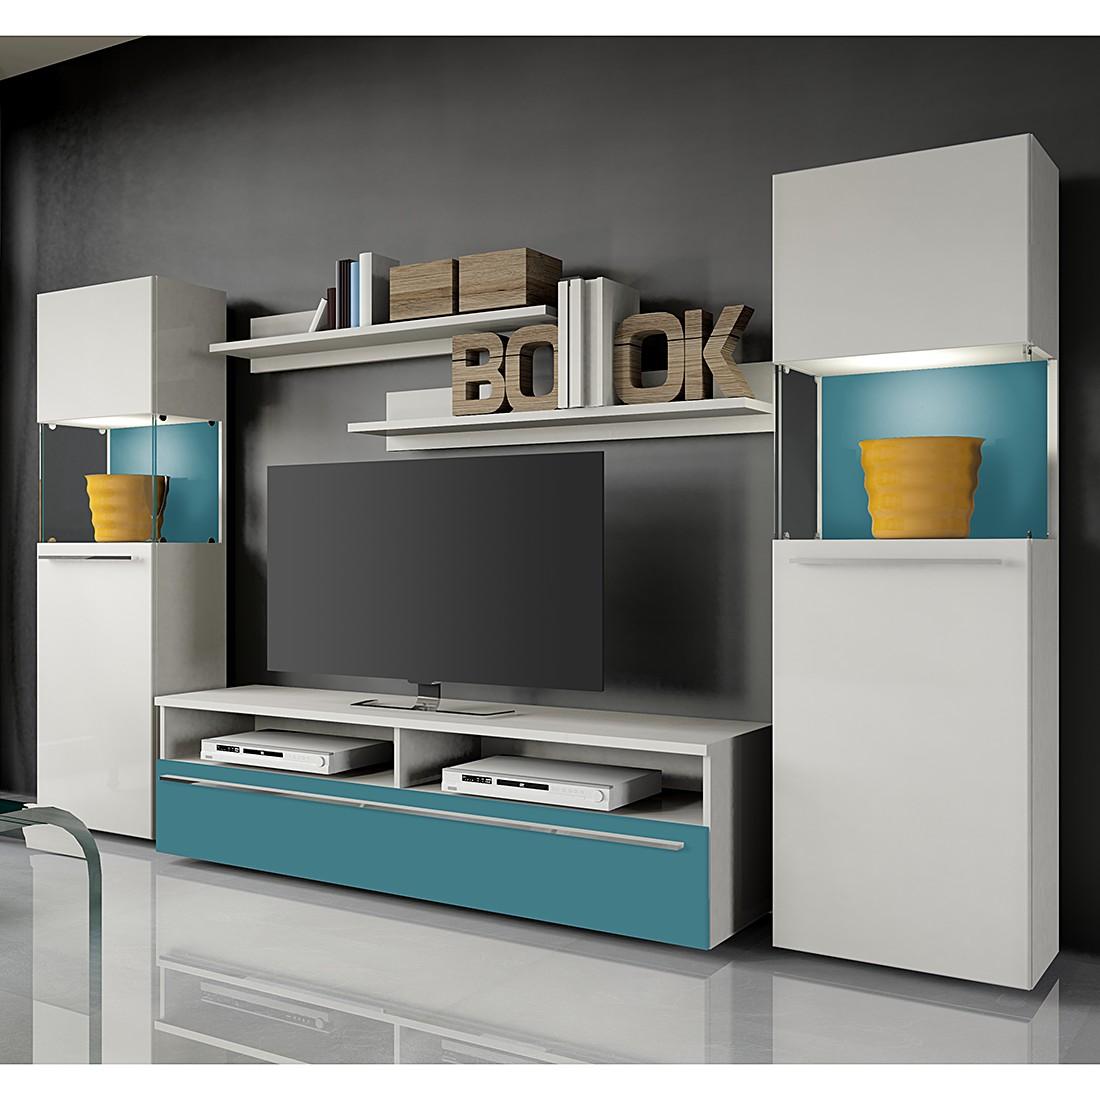 eek a wohnwand compact iii 5 teilig wei absetzung petrol mit beleuchtung california kaufen. Black Bedroom Furniture Sets. Home Design Ideas